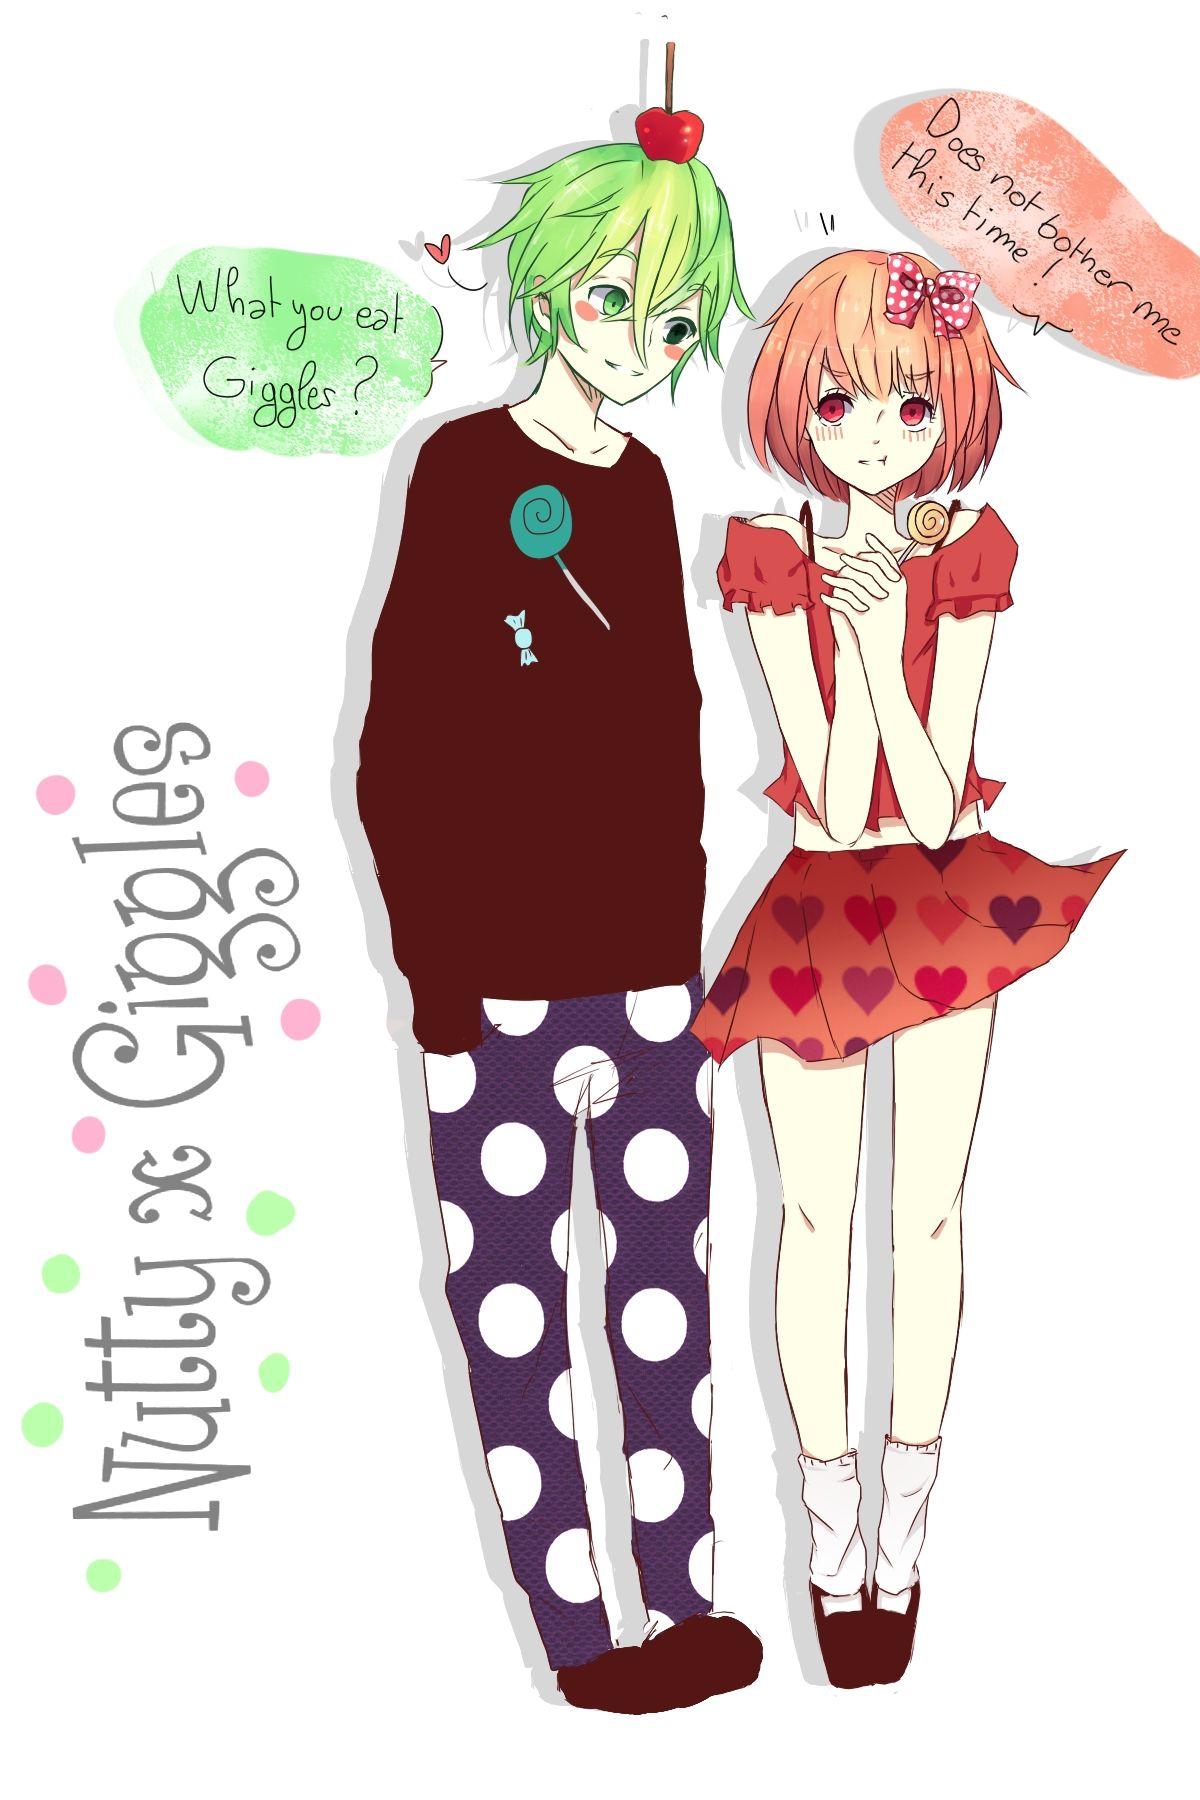 Happy Tree Friends (HTF anime) Nutty x Giggles